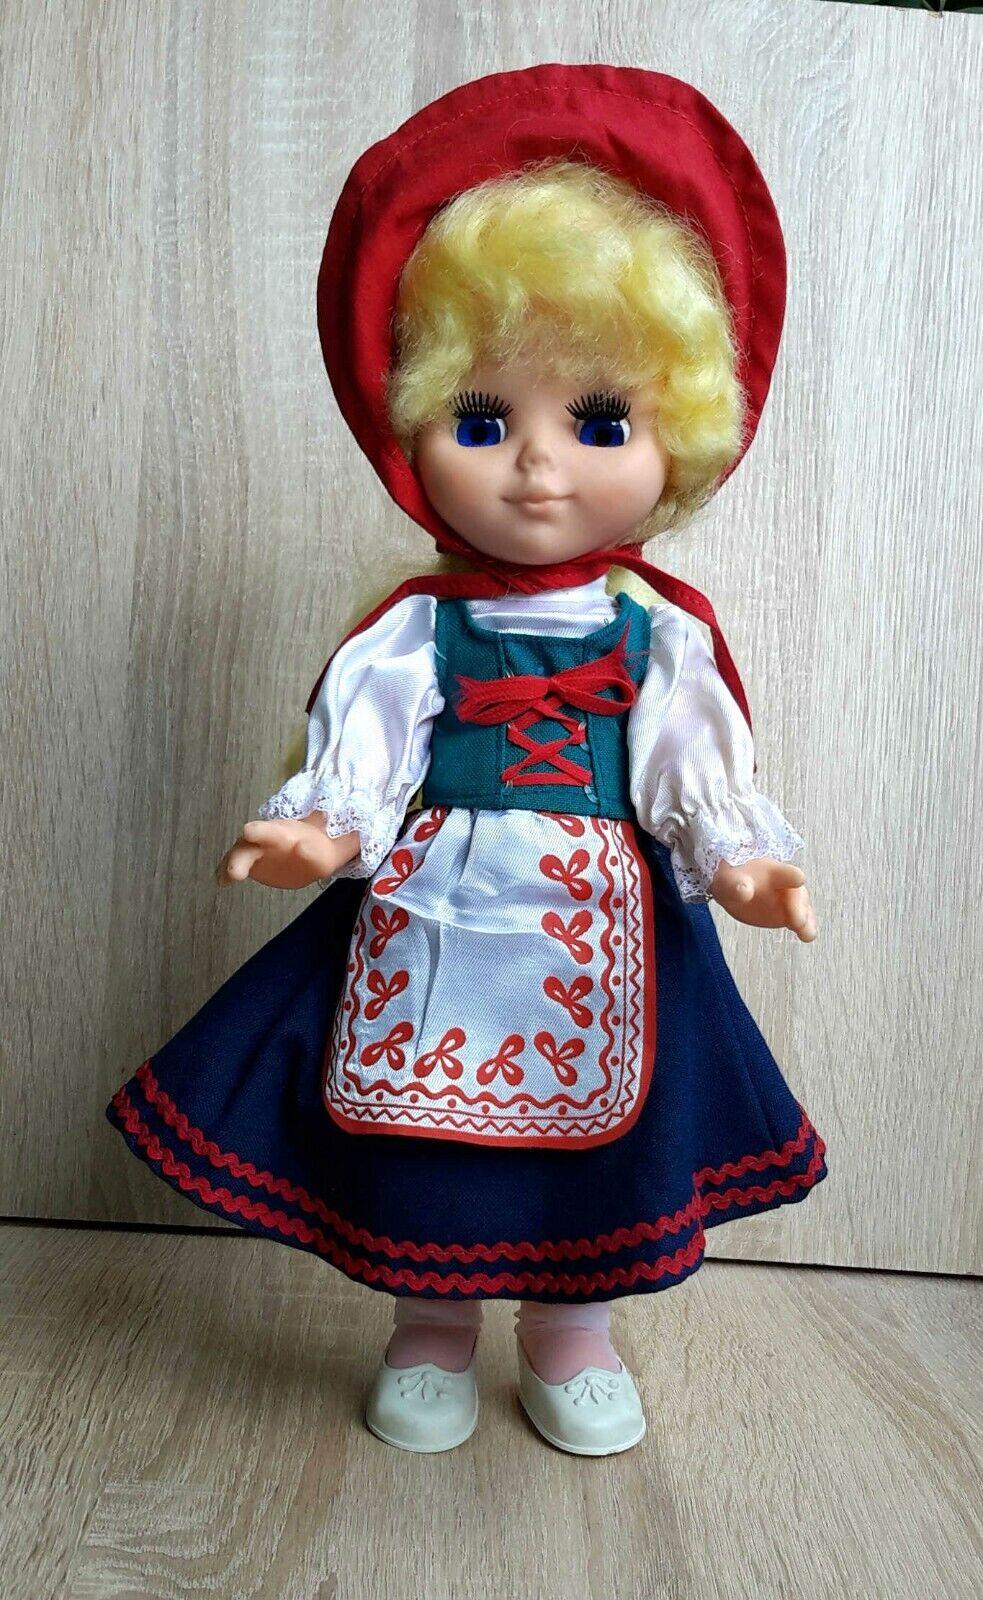 Década de 1970 urss Soviet Russian Muñeca personaje de cuento de hadas  Little rojo Cap